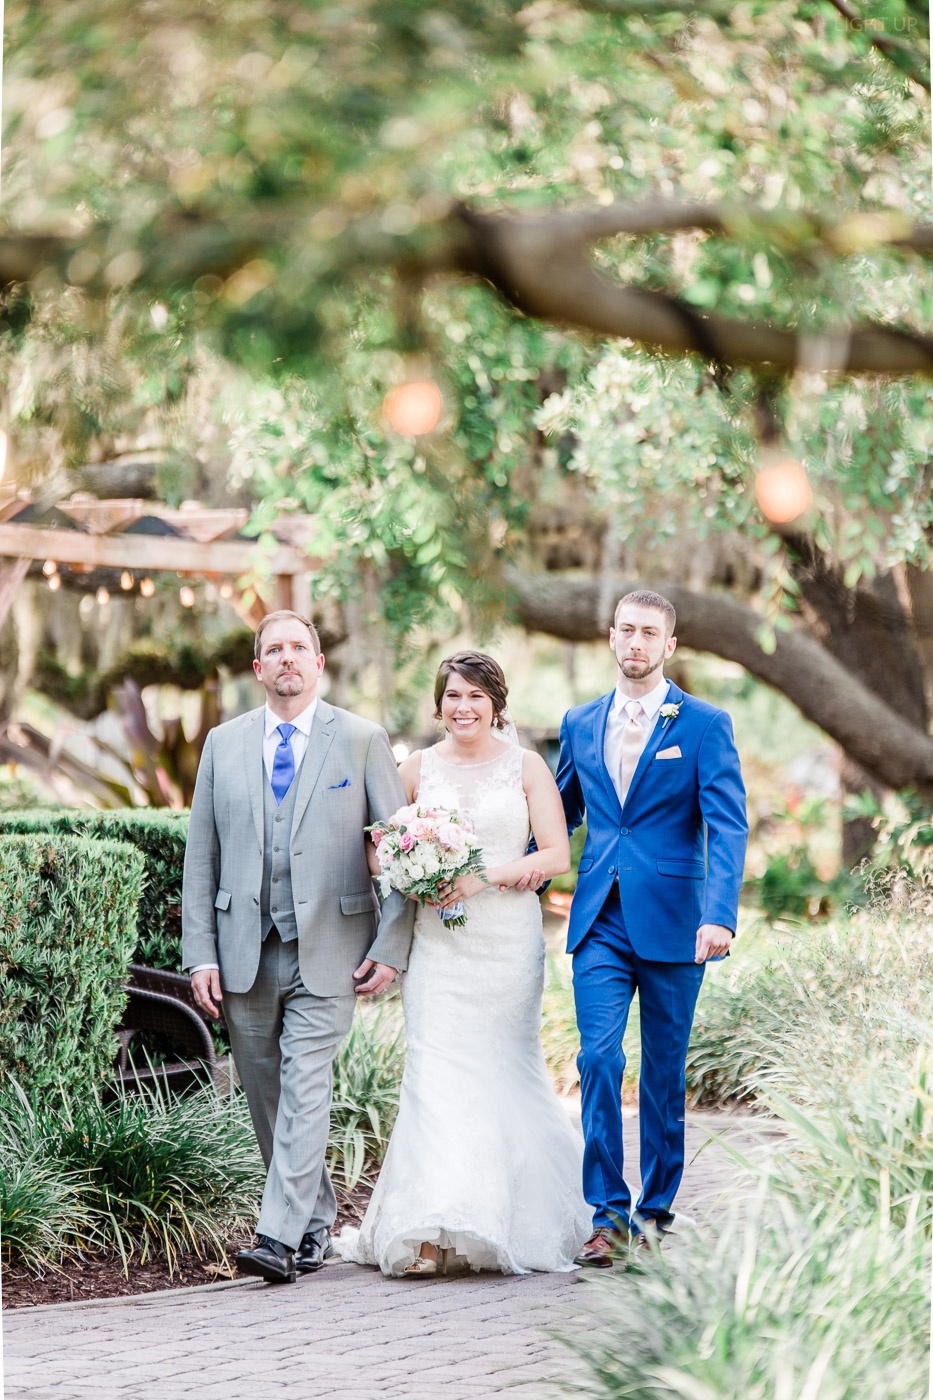 hstoric-dubsdread-wedding-orlando-9.jpg